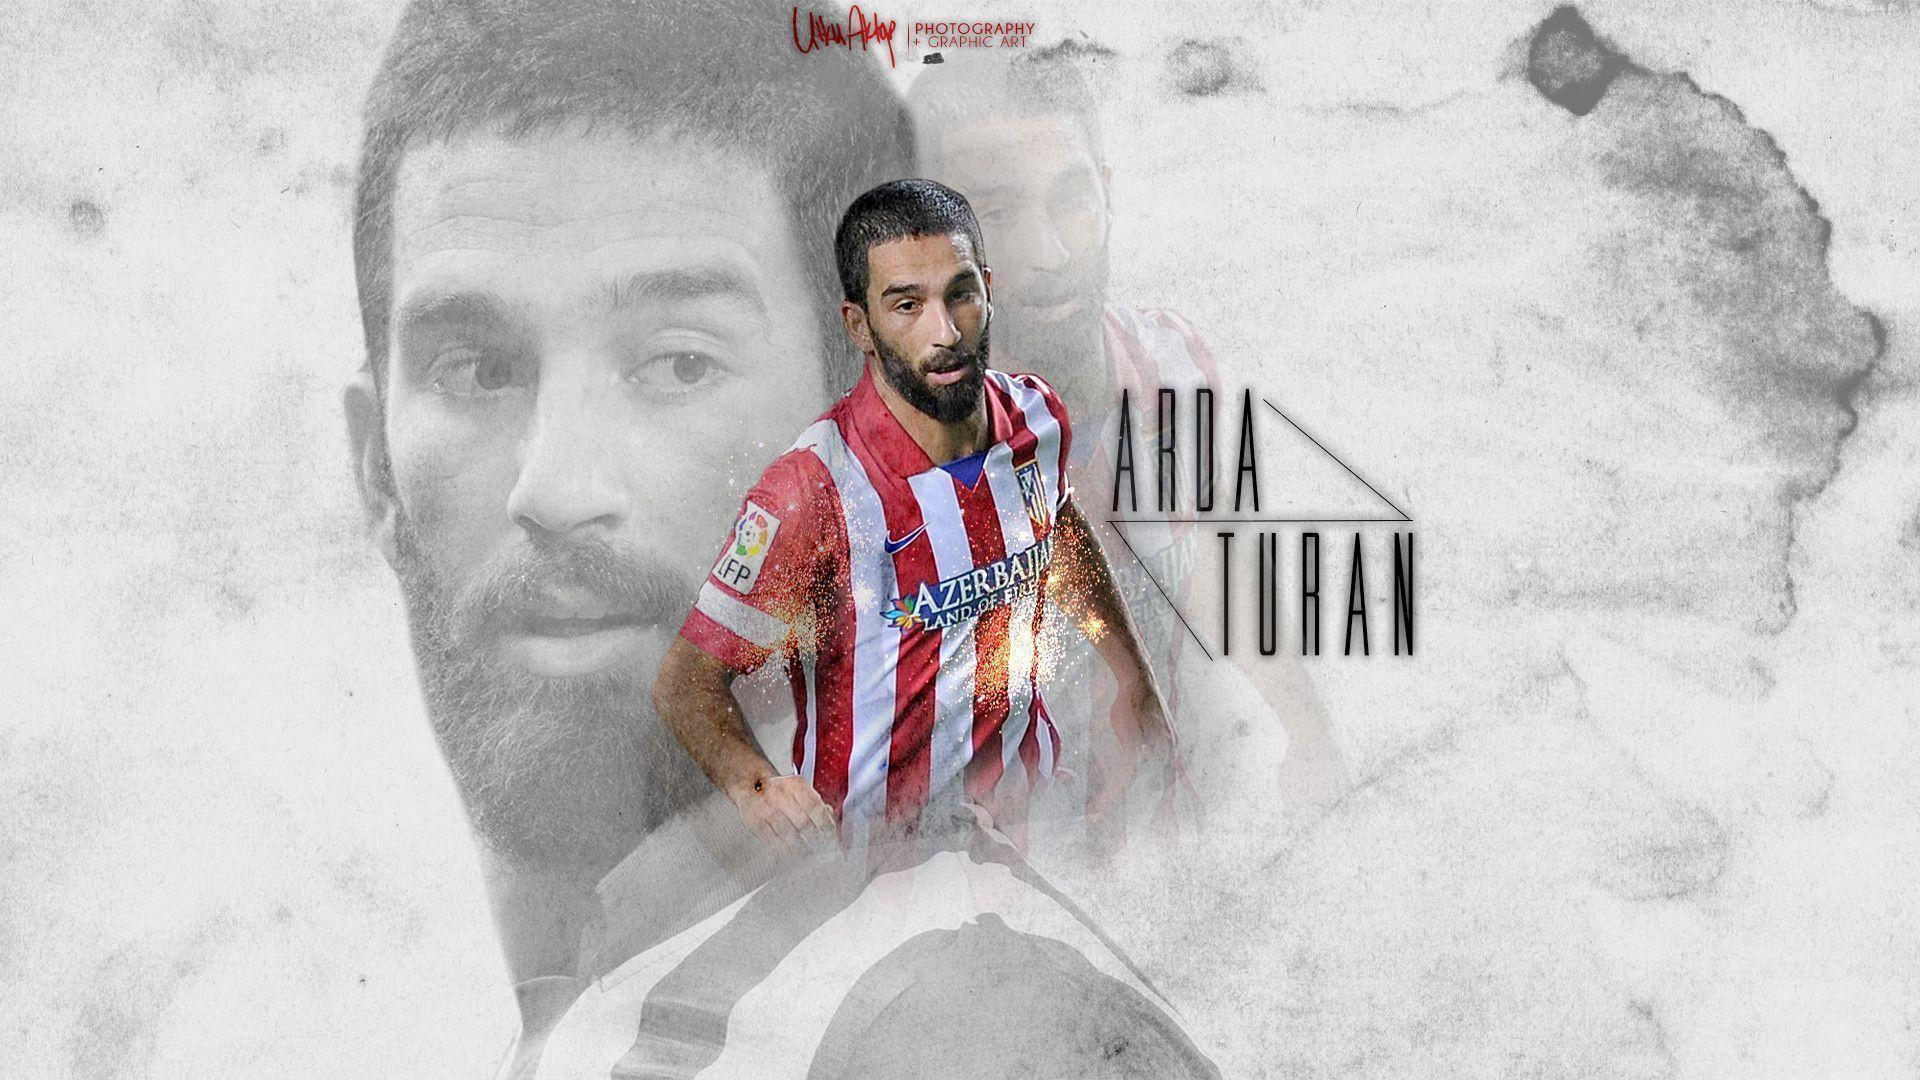 Arda Turan Atletico Madrid HD WALLPAPER 2013 by UtkuGrafik on ...